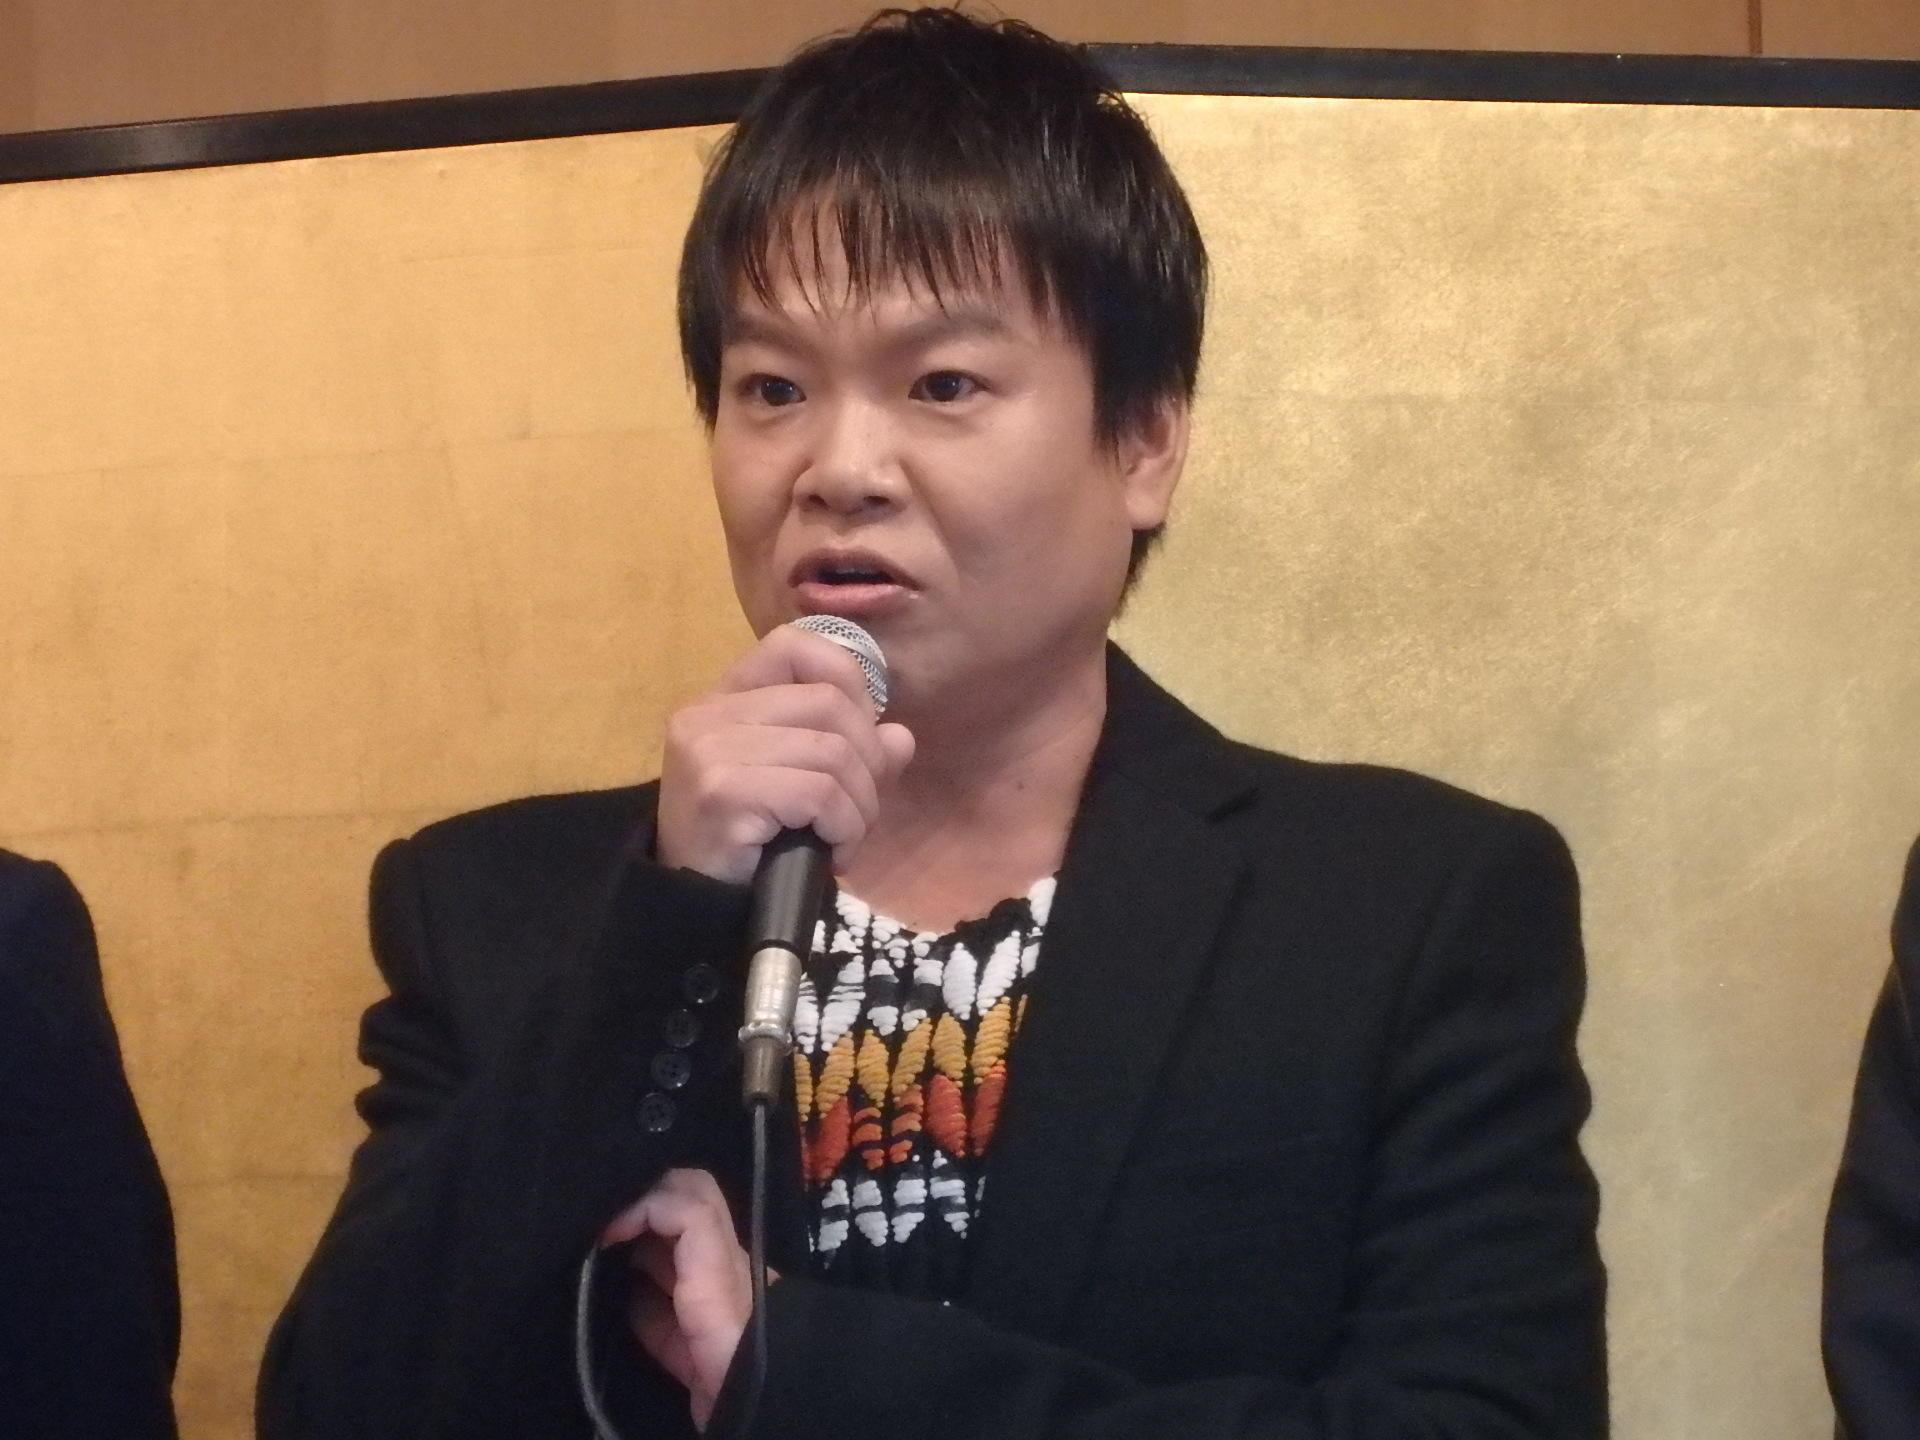 http://news.yoshimoto.co.jp/20160930193132-4d34e654934643cbfa0c825baffadea4ed630fdb.jpg